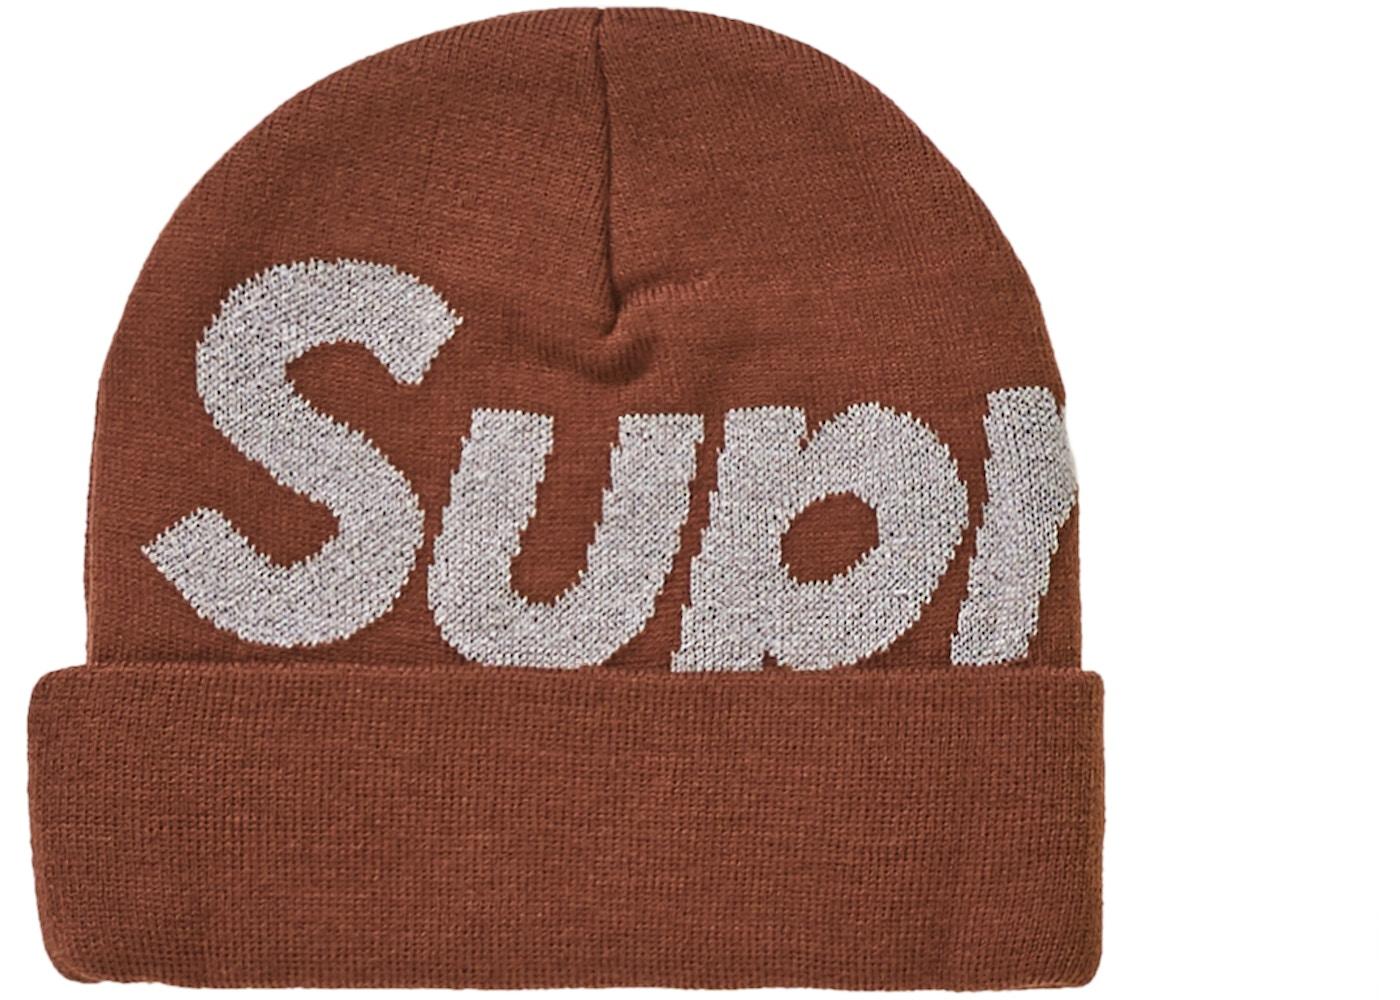 ca9a1098d95 Streetwear - Supreme Headwear - New Lowest Asks